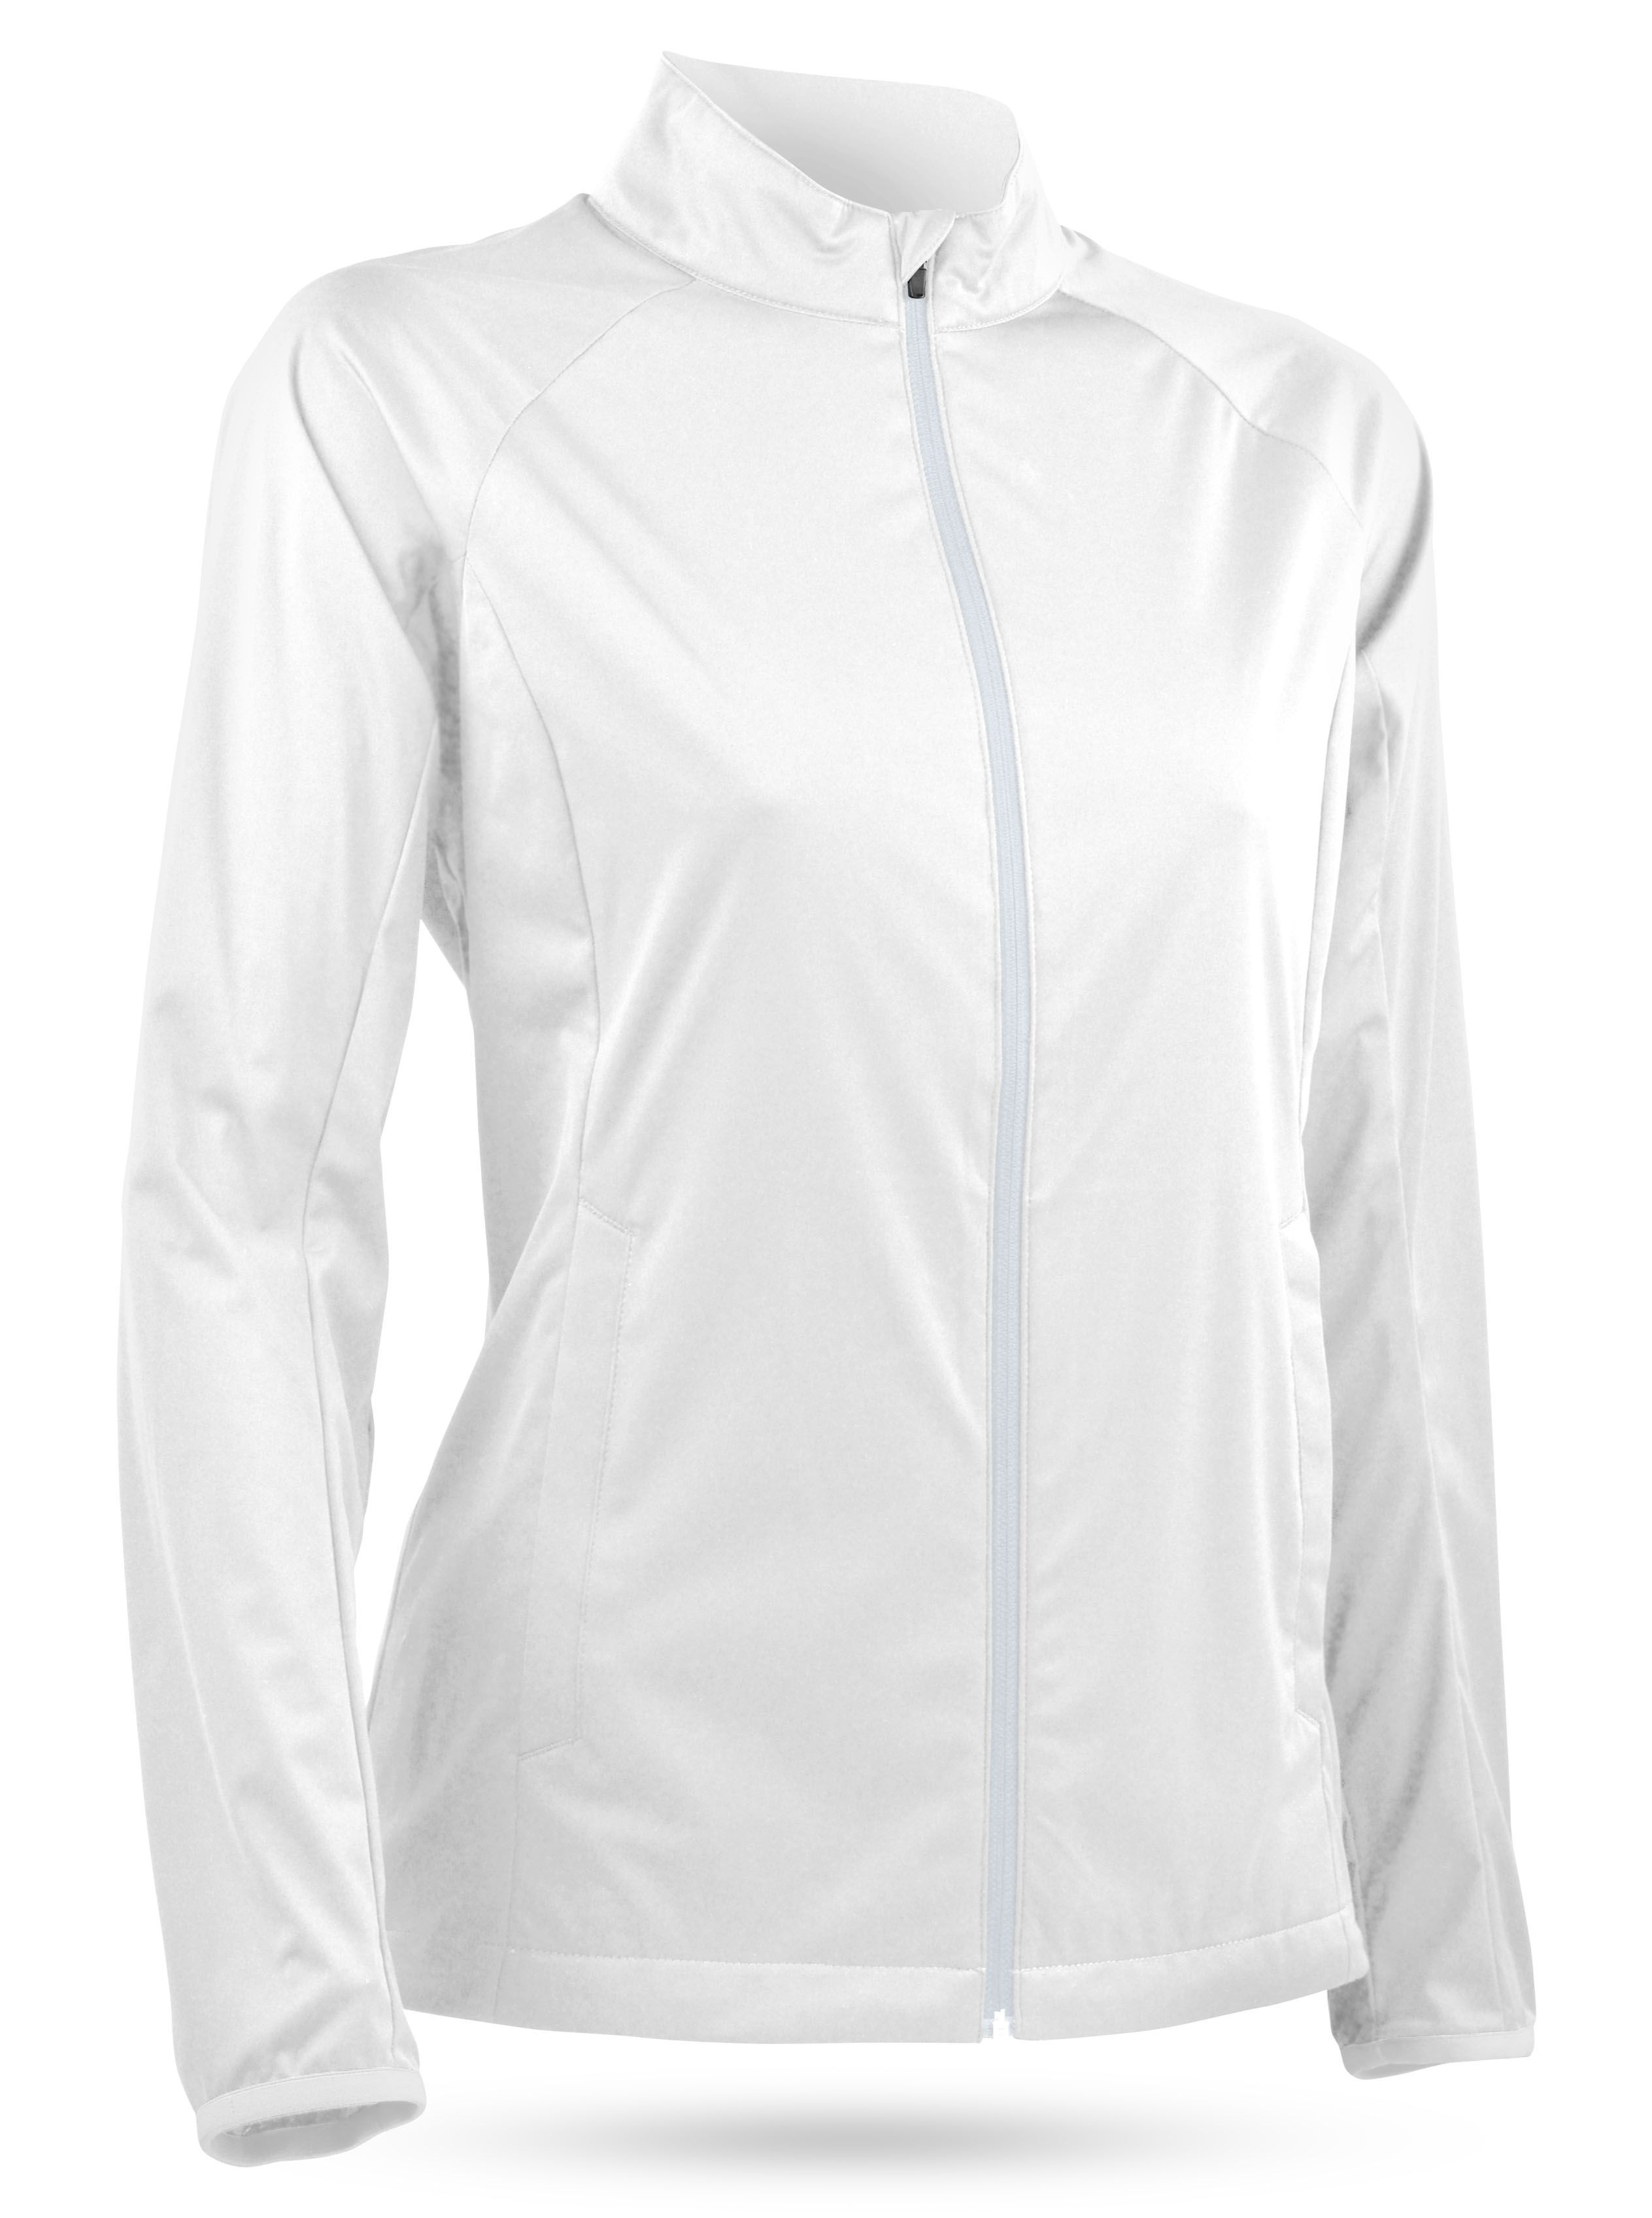 Women S Zephyr Lt Jacket Golf Outerwear Apparel Sun Mountain In 2020 Womens Golf Fashion Golf Outfit Golf Jackets